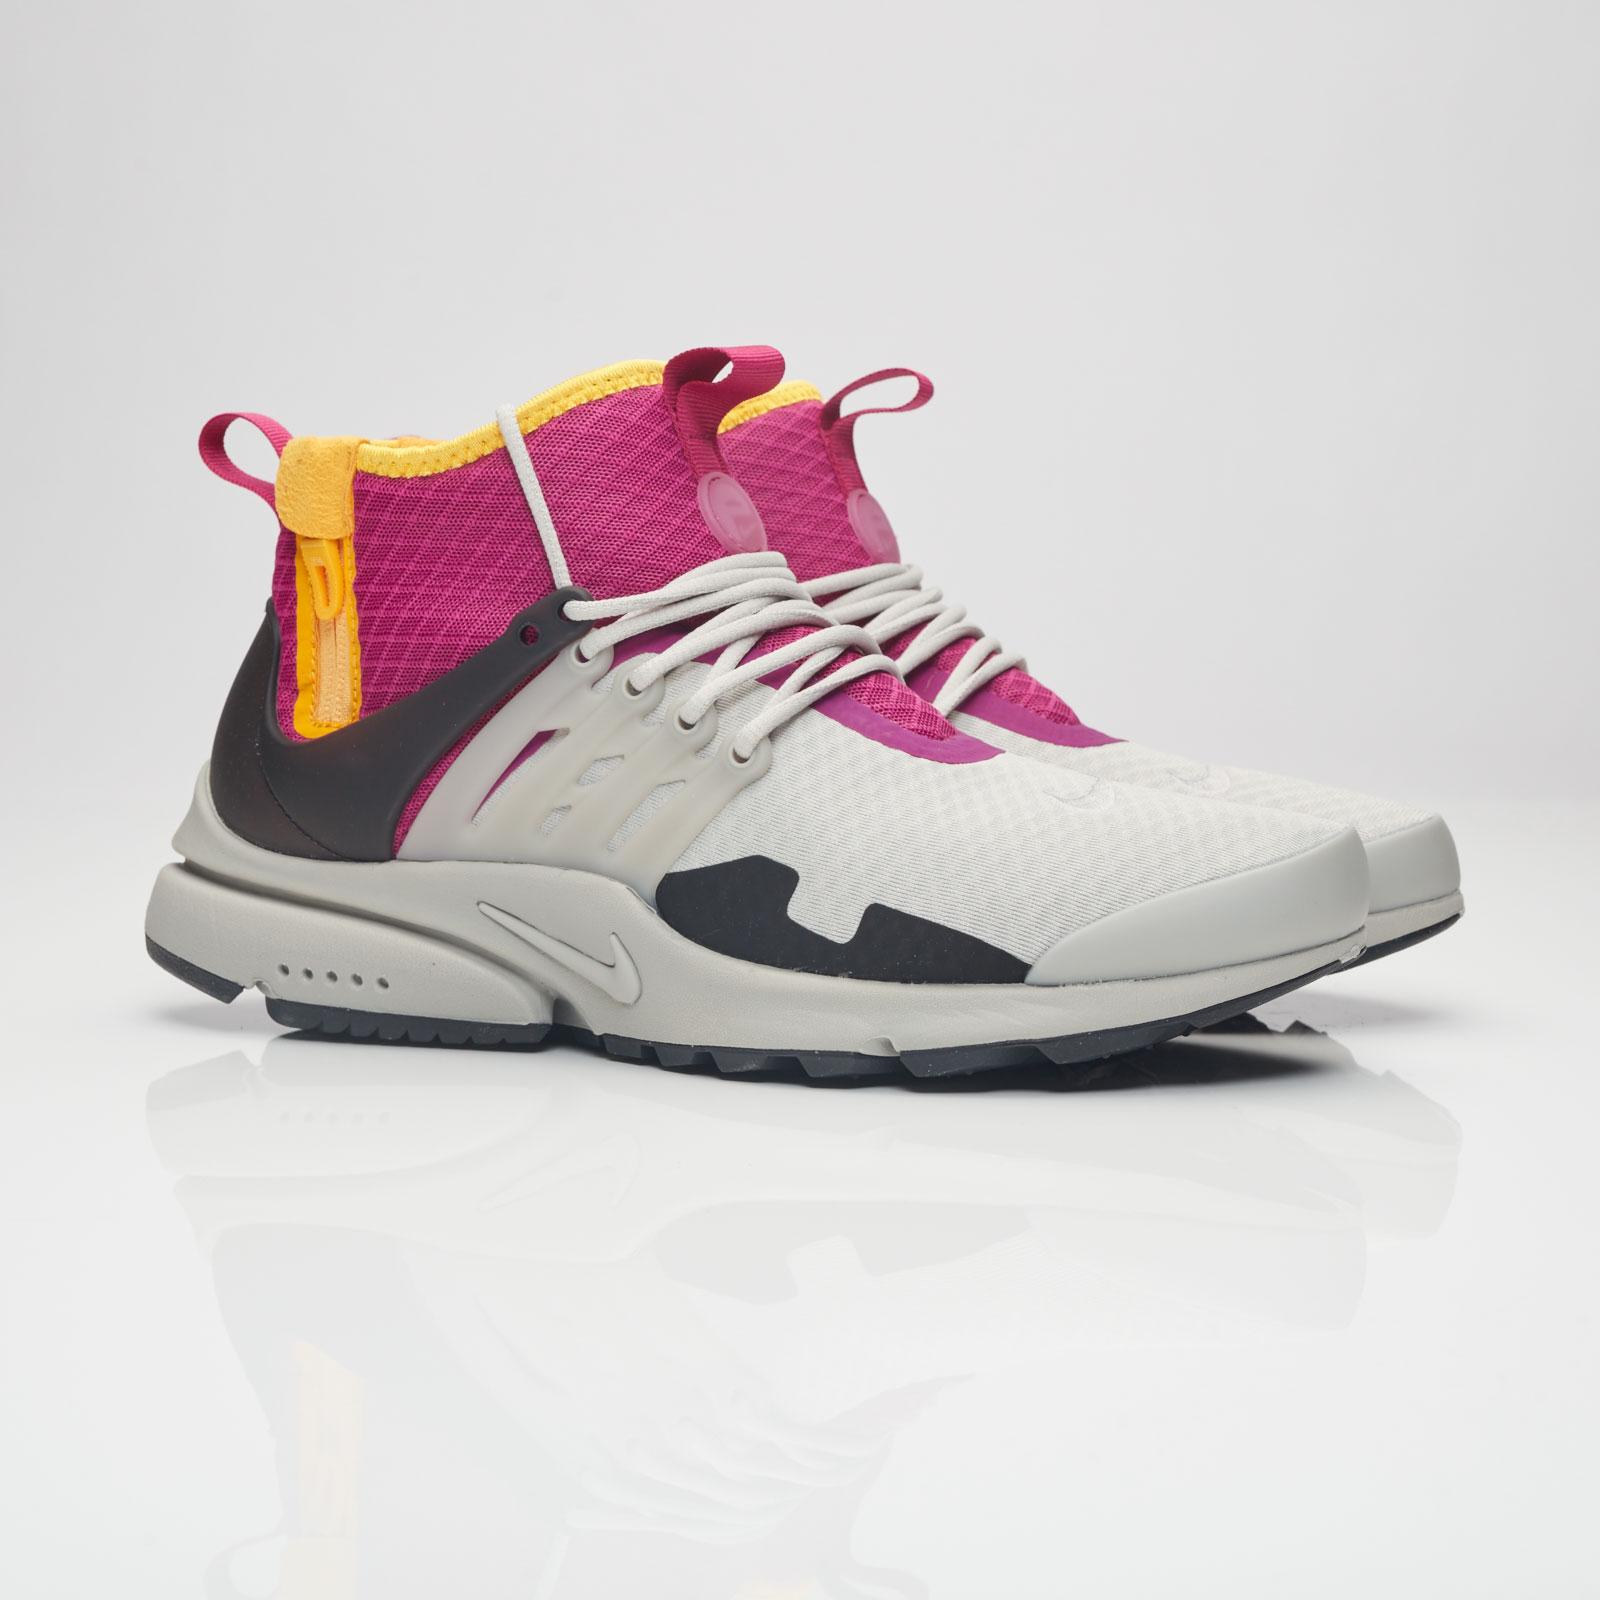 wholesale dealer a2474 9016a ... ireland nike sportswear air presto mid sp d04d3 78474